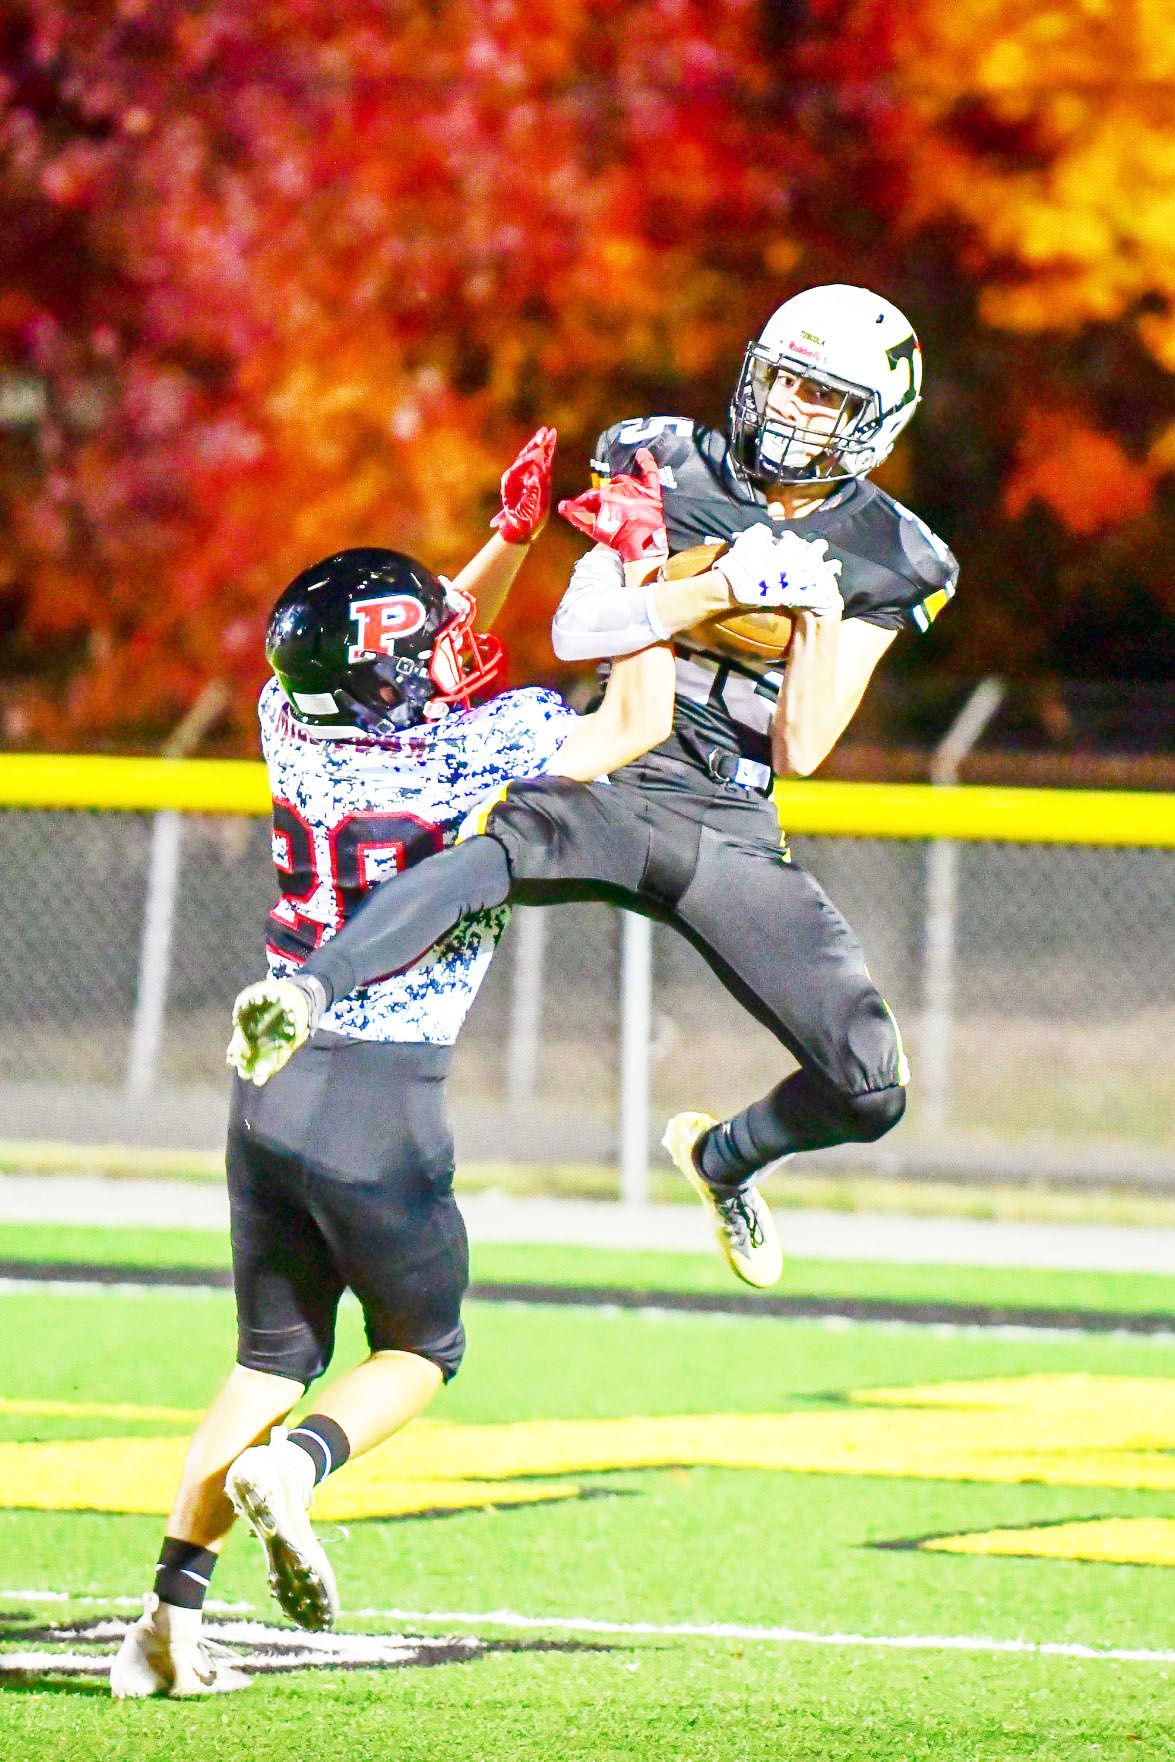 Clay Burgess catches a touchdown pass